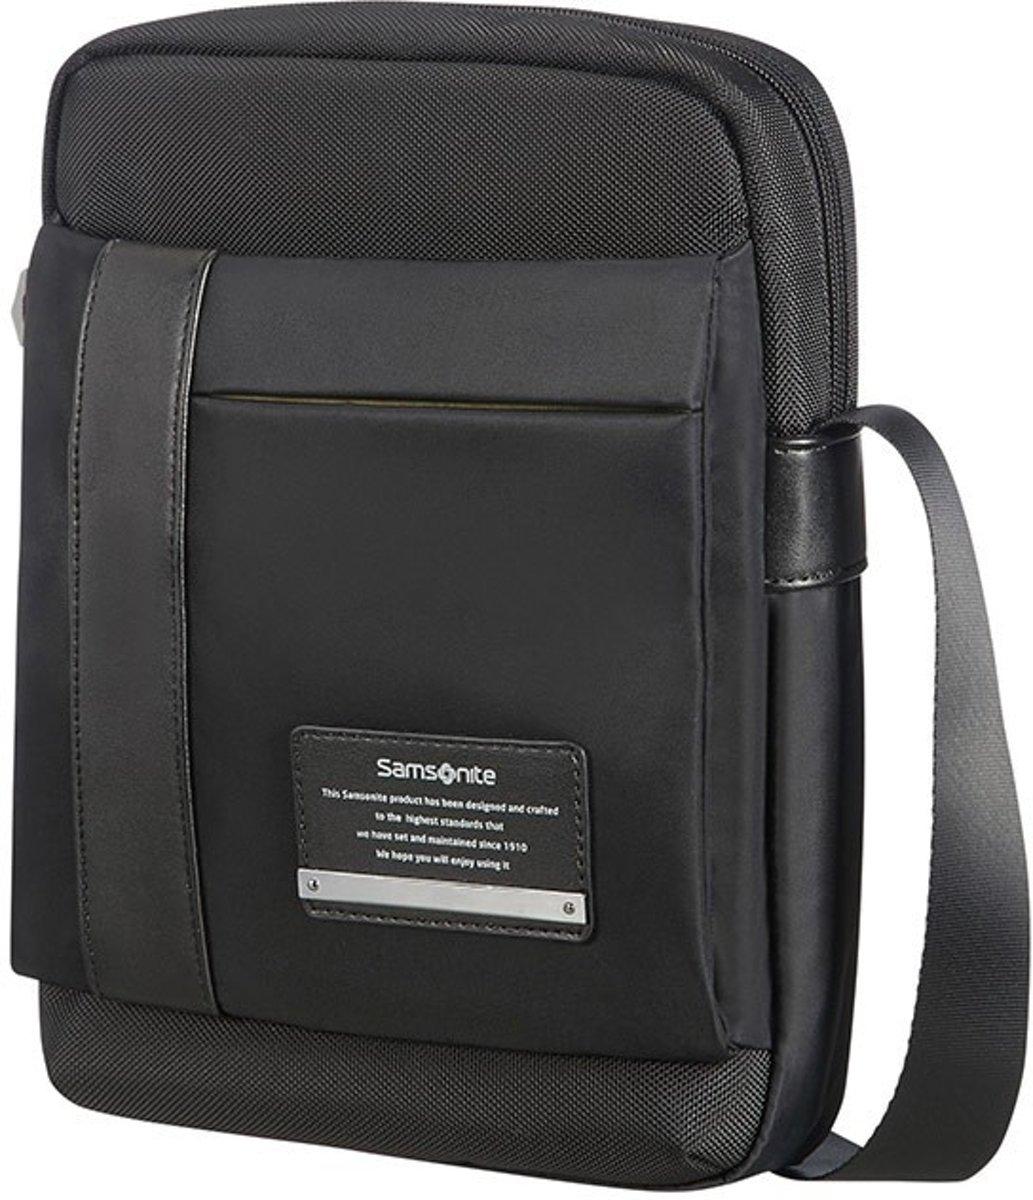 Samsonite Tabletschoudertas - Openroad Tablet Crossover 9.7 inch Jet Black kopen